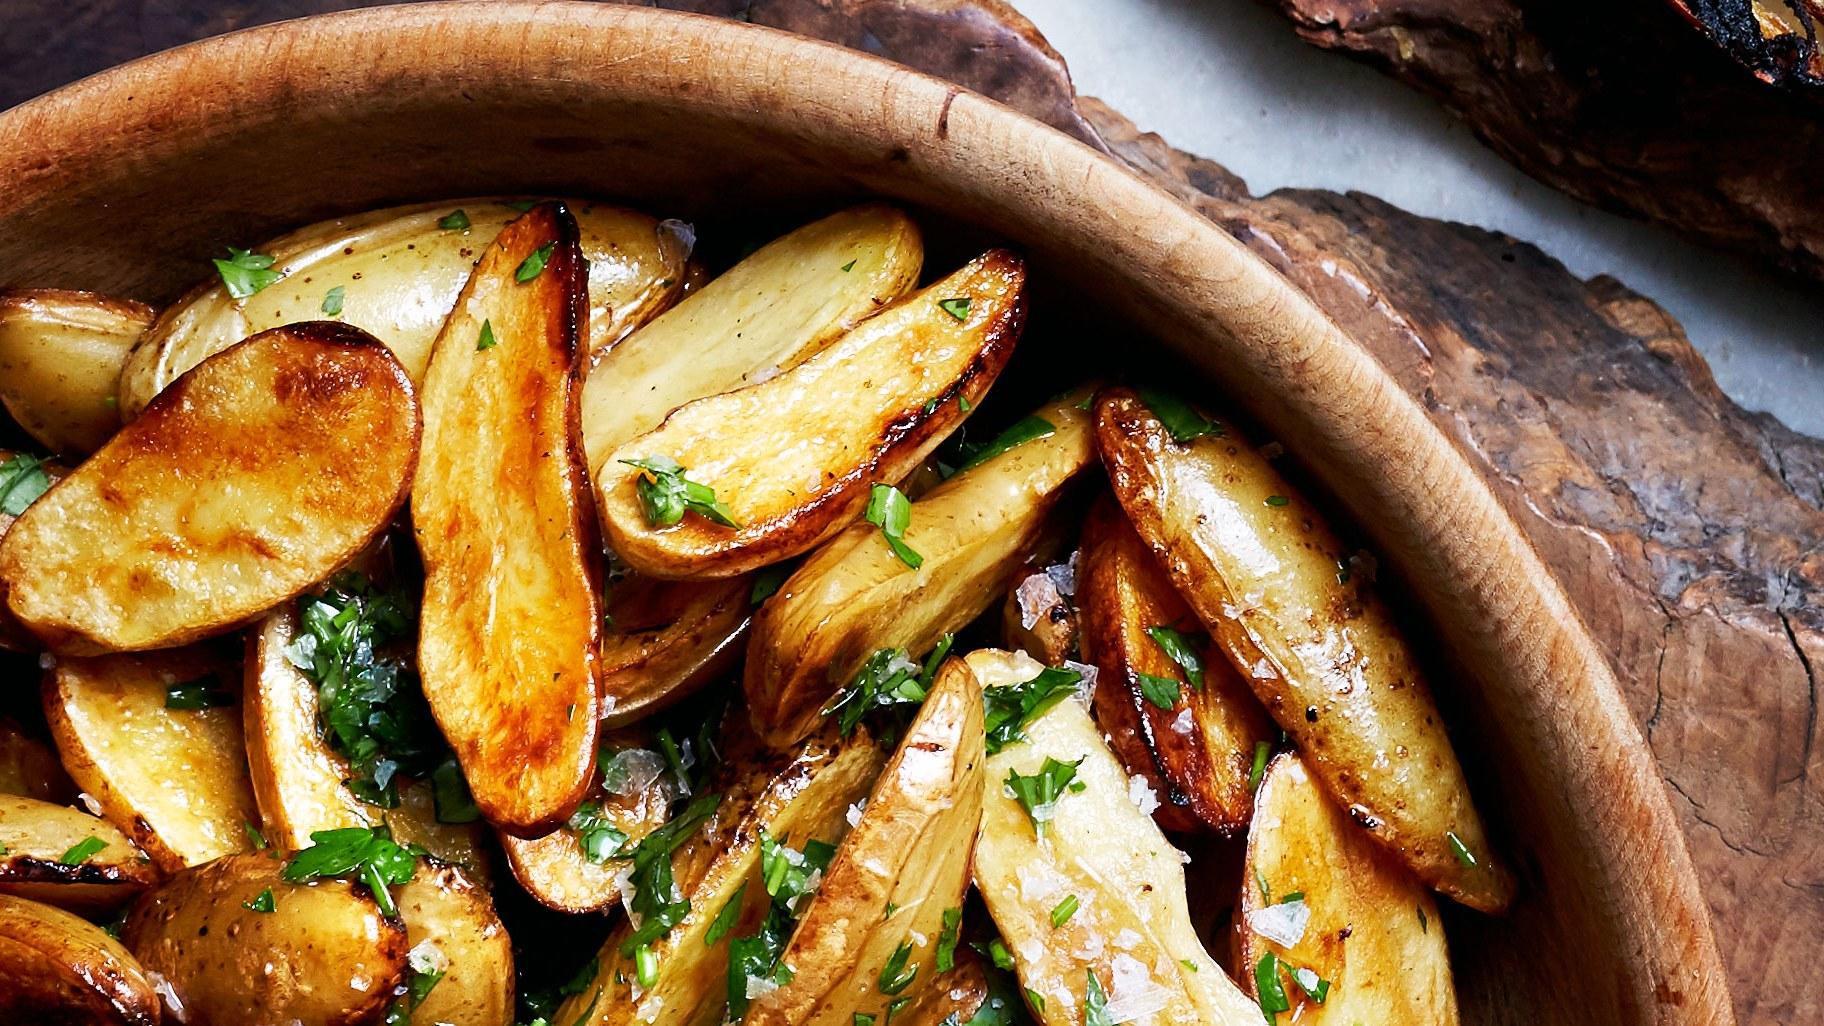 lemon-and-parsley-skillet-roasted-fingerling-potatoes